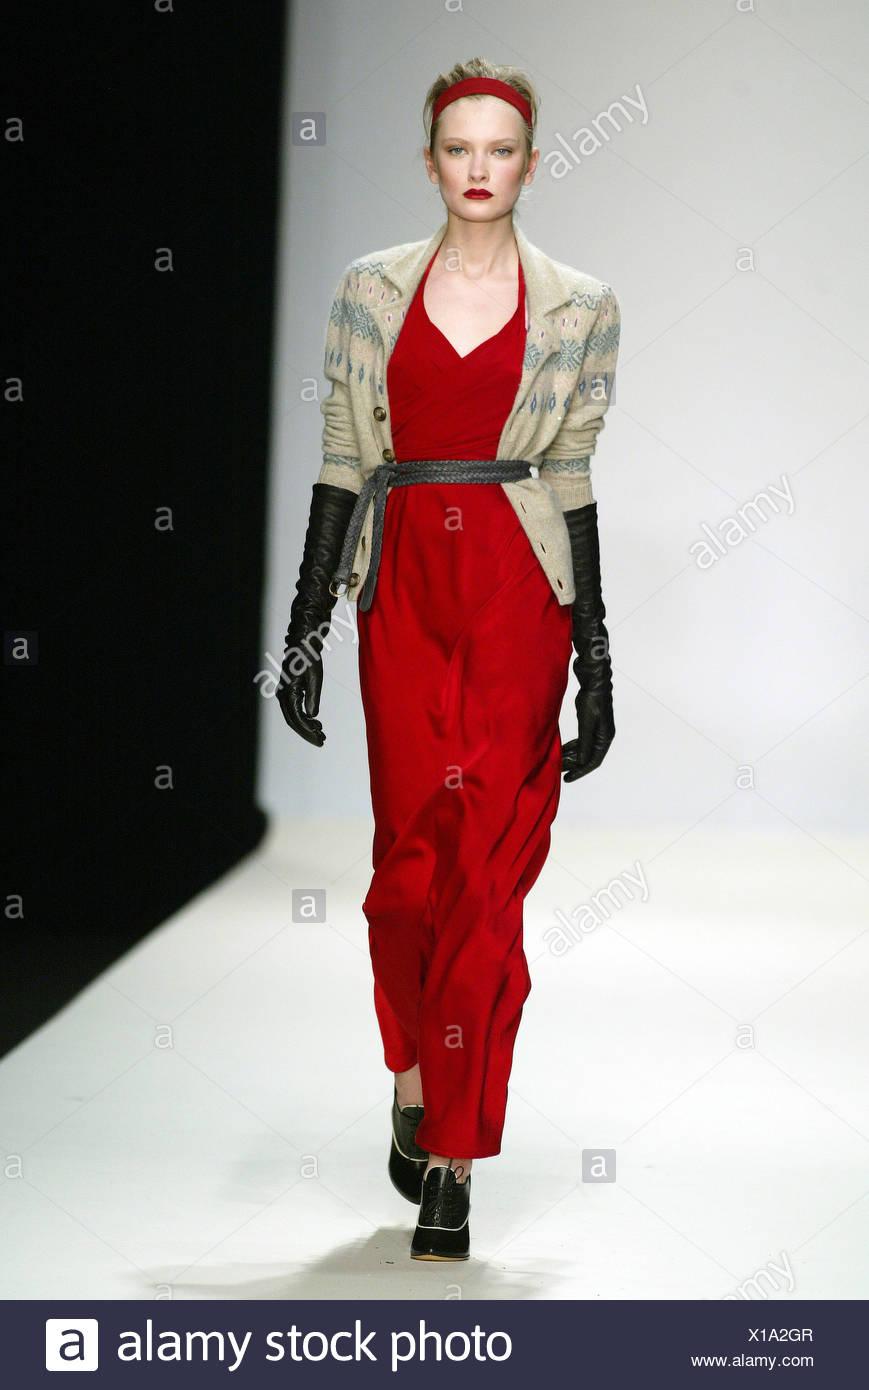 c304ea8165c Ghost London Ready to Wear Autumn Winter Blonde female model wearing full  length red silk halter dress worn under an oatmeal